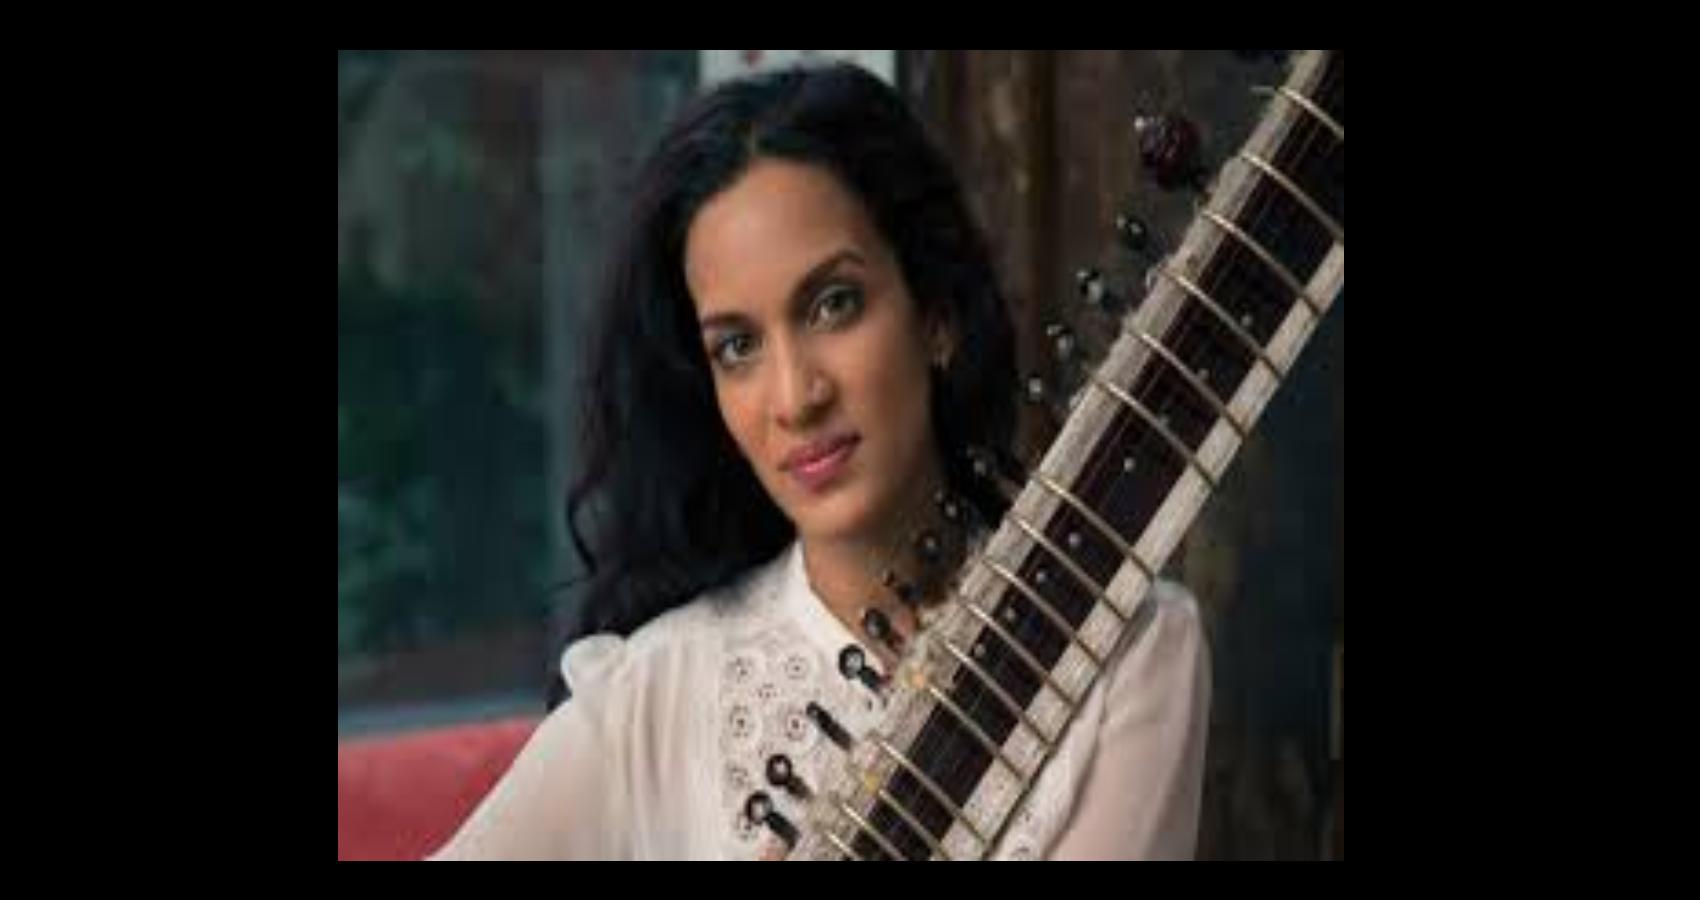 Anoushka Shankar Announces New Track, 'Sister Susannah'